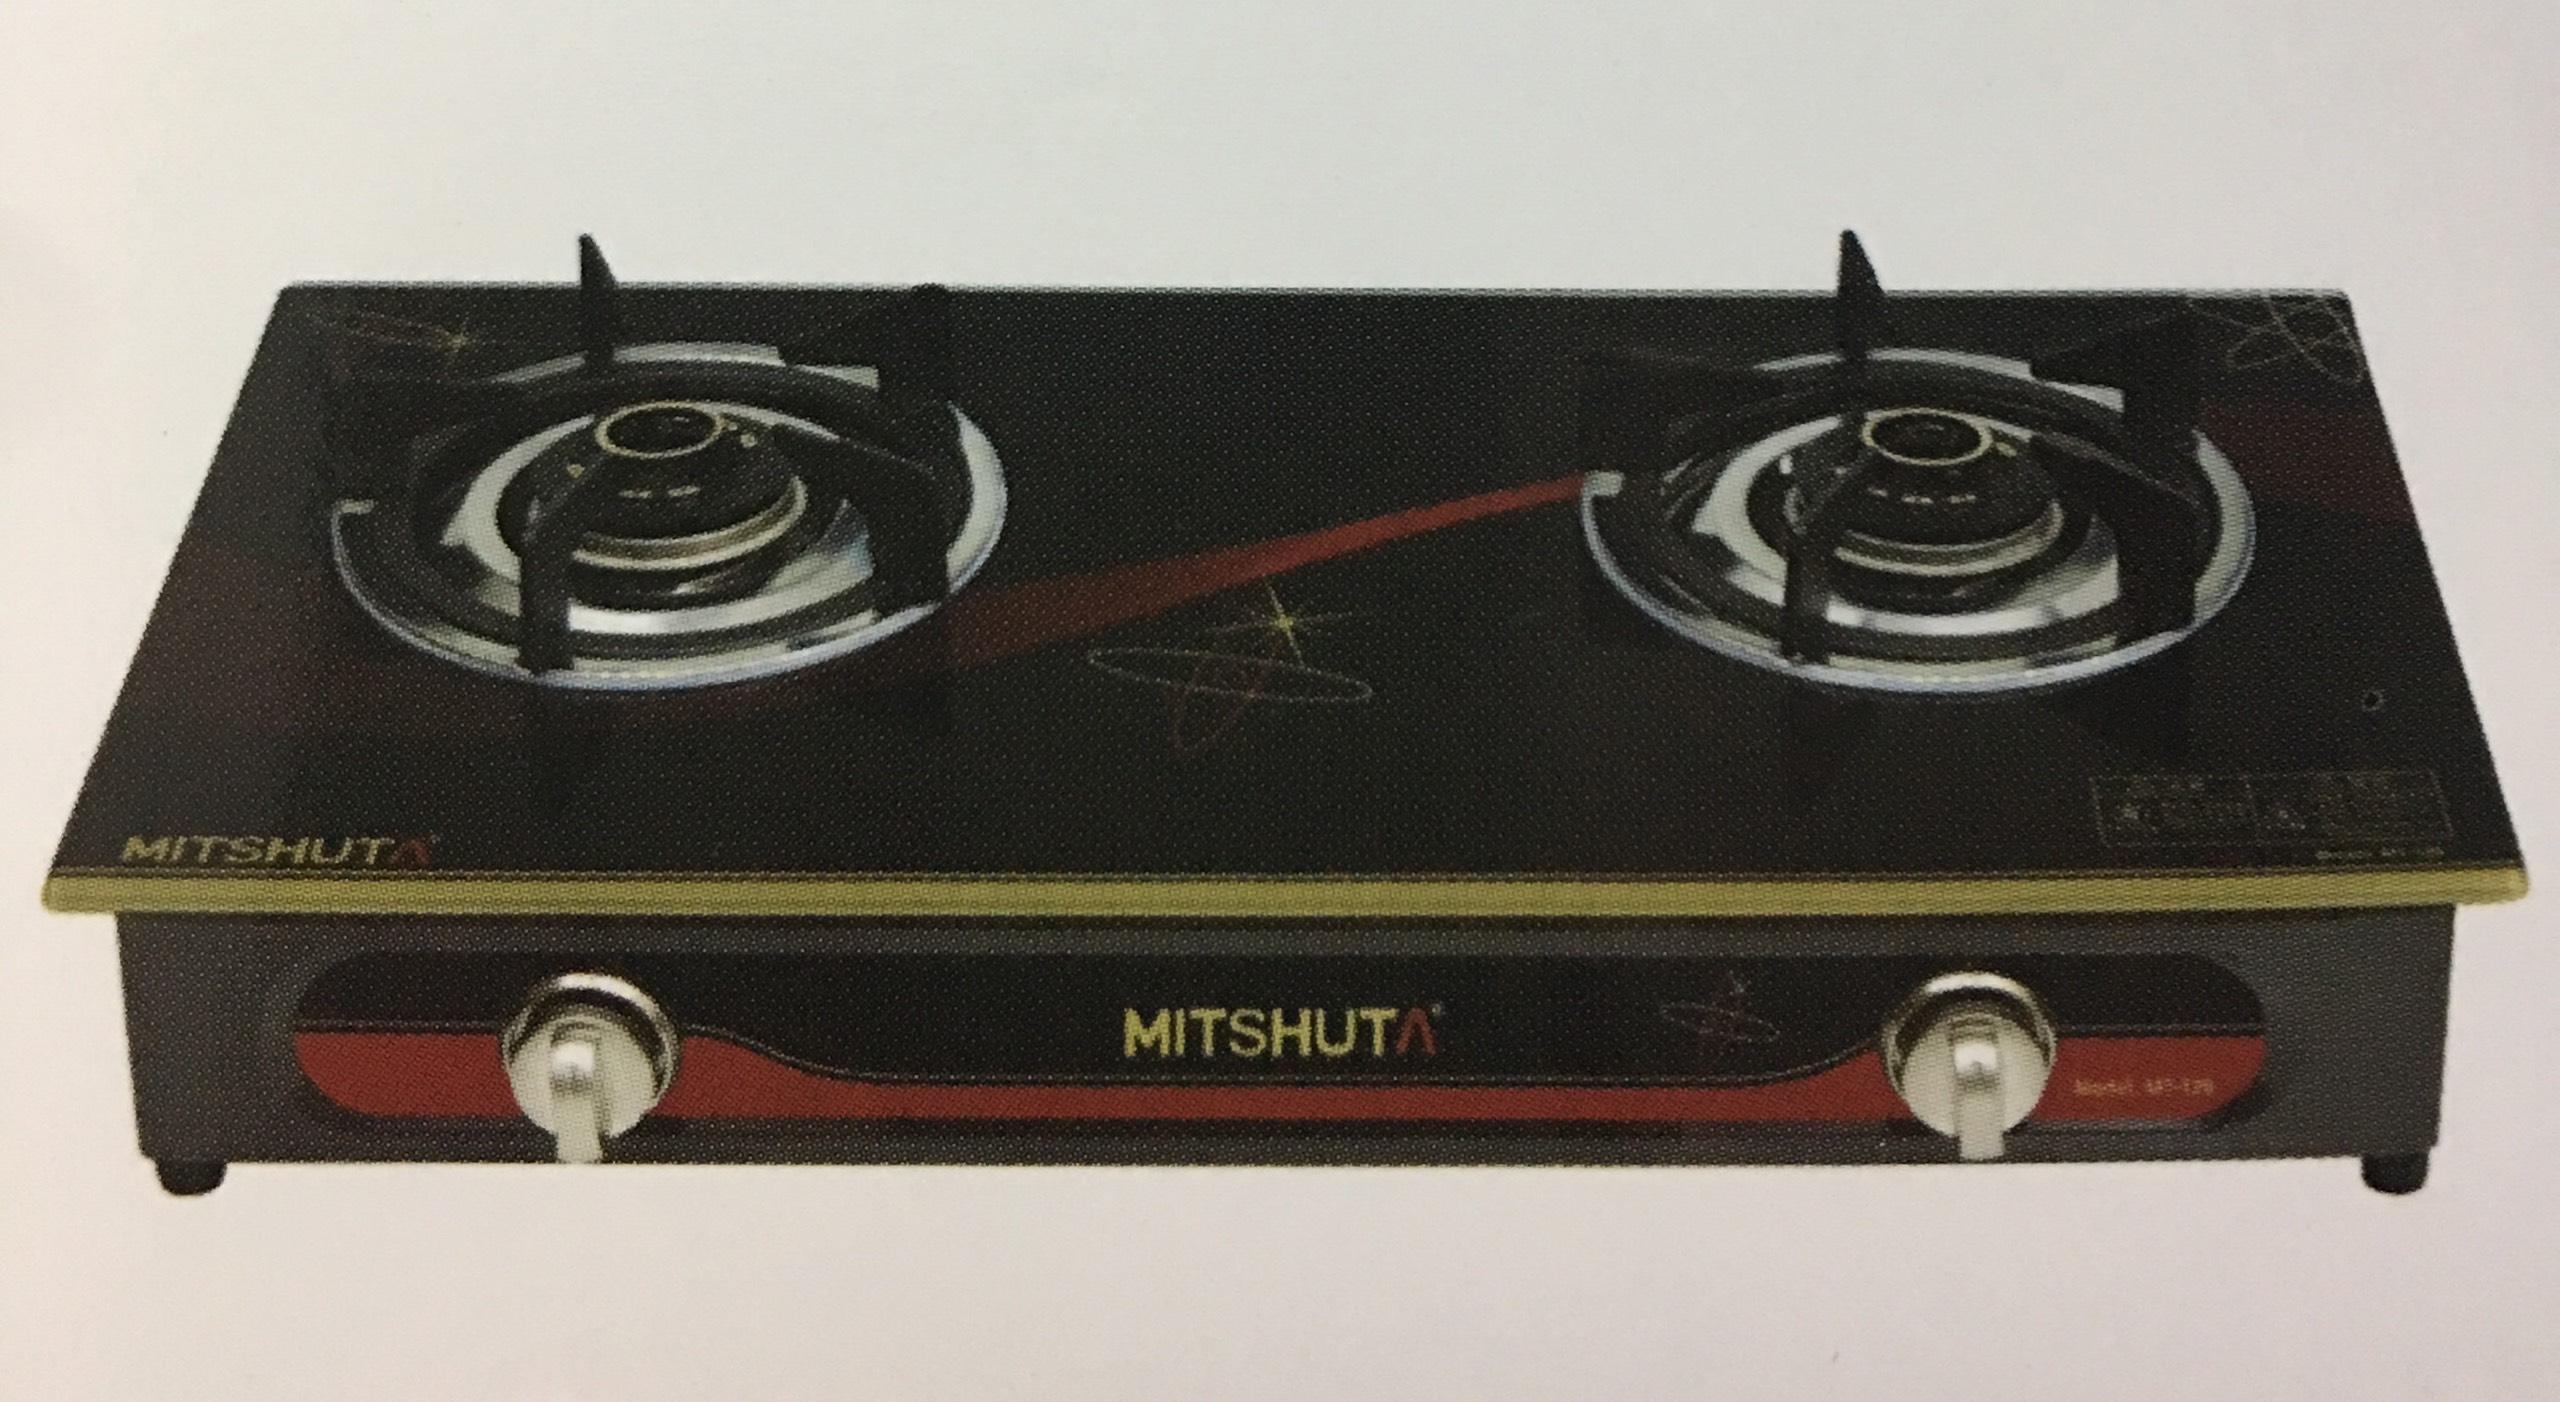 Bếp gas dương Mitshuta MT-129